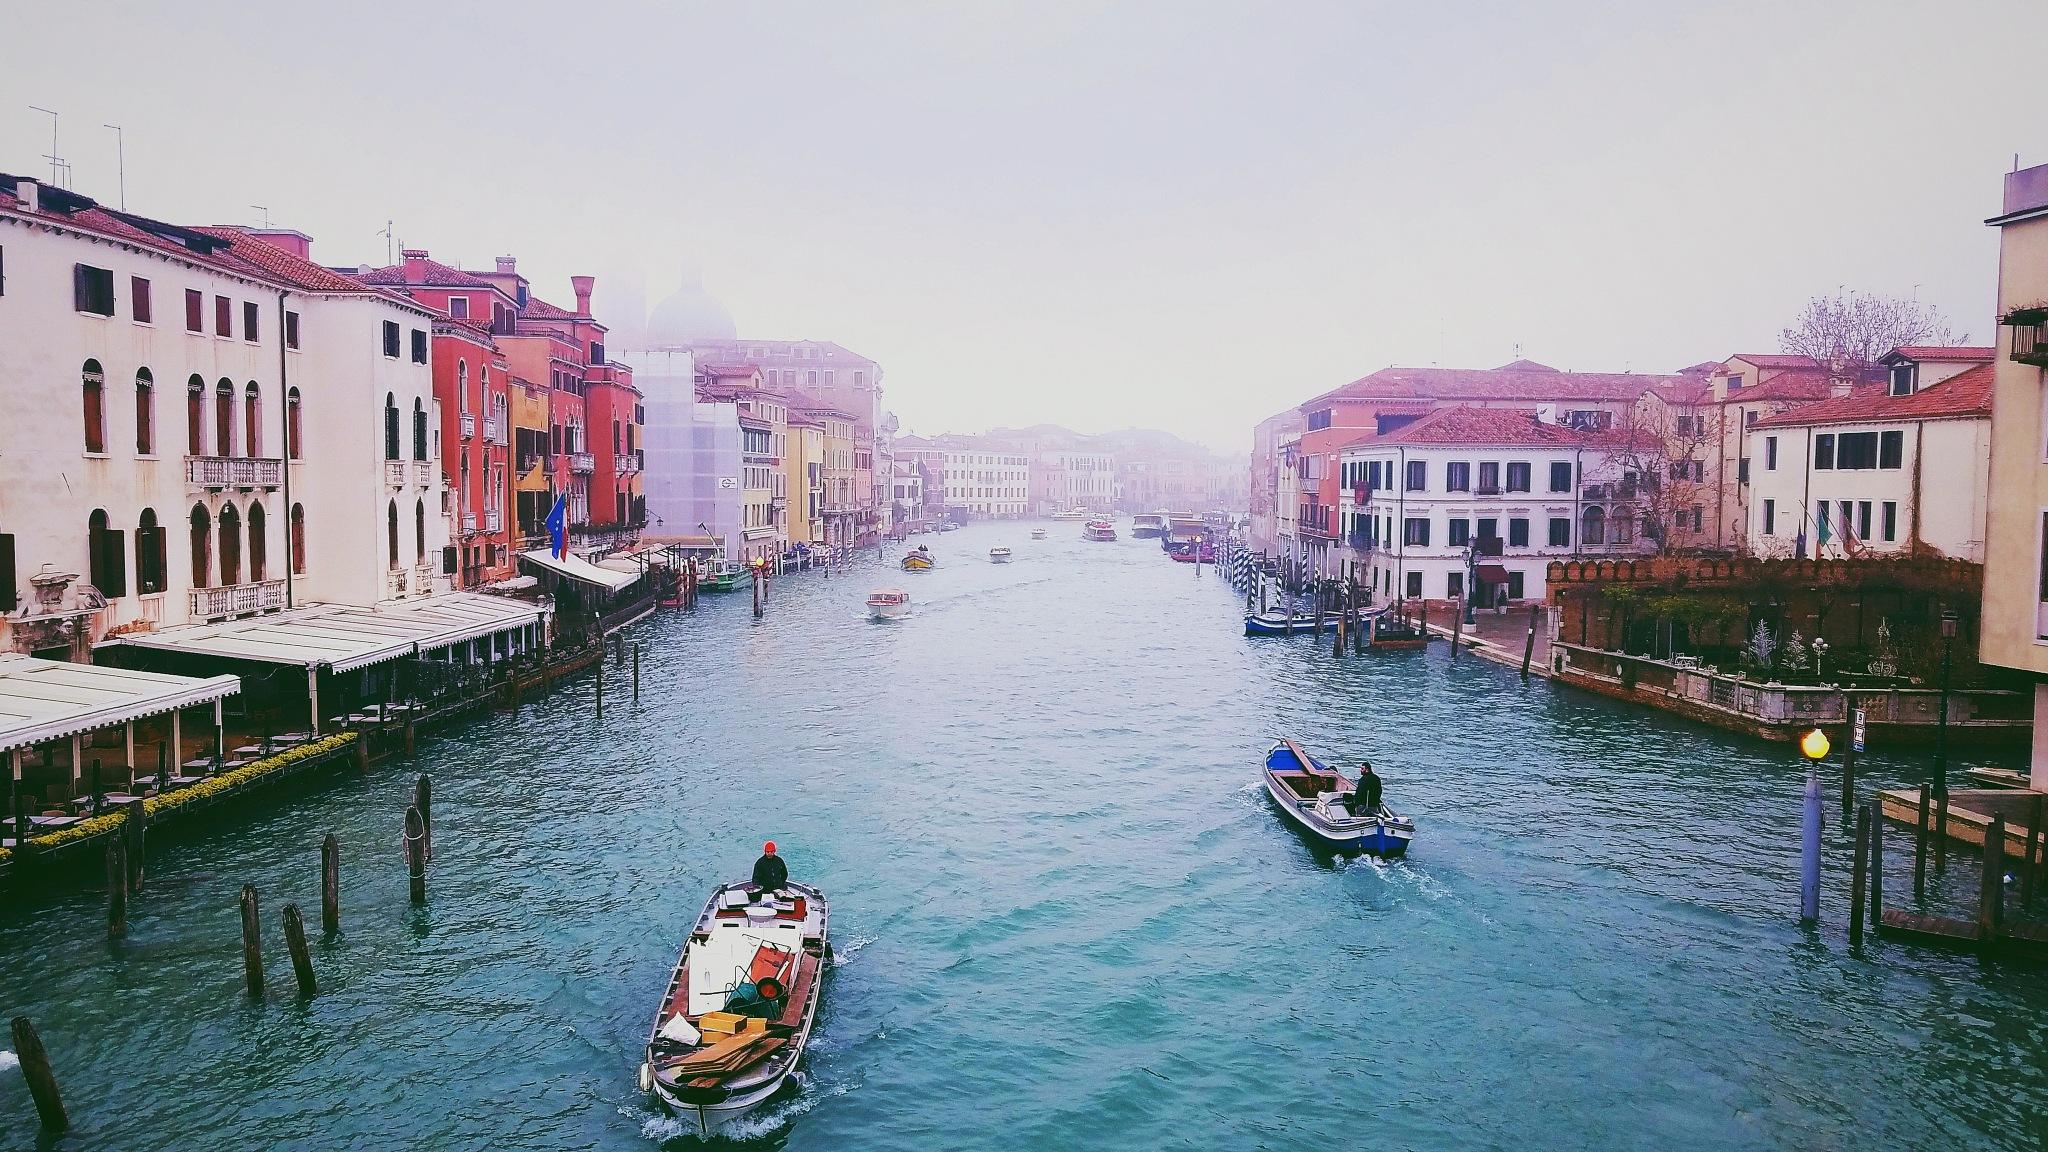 Venice Under Fog by Franklin Roman